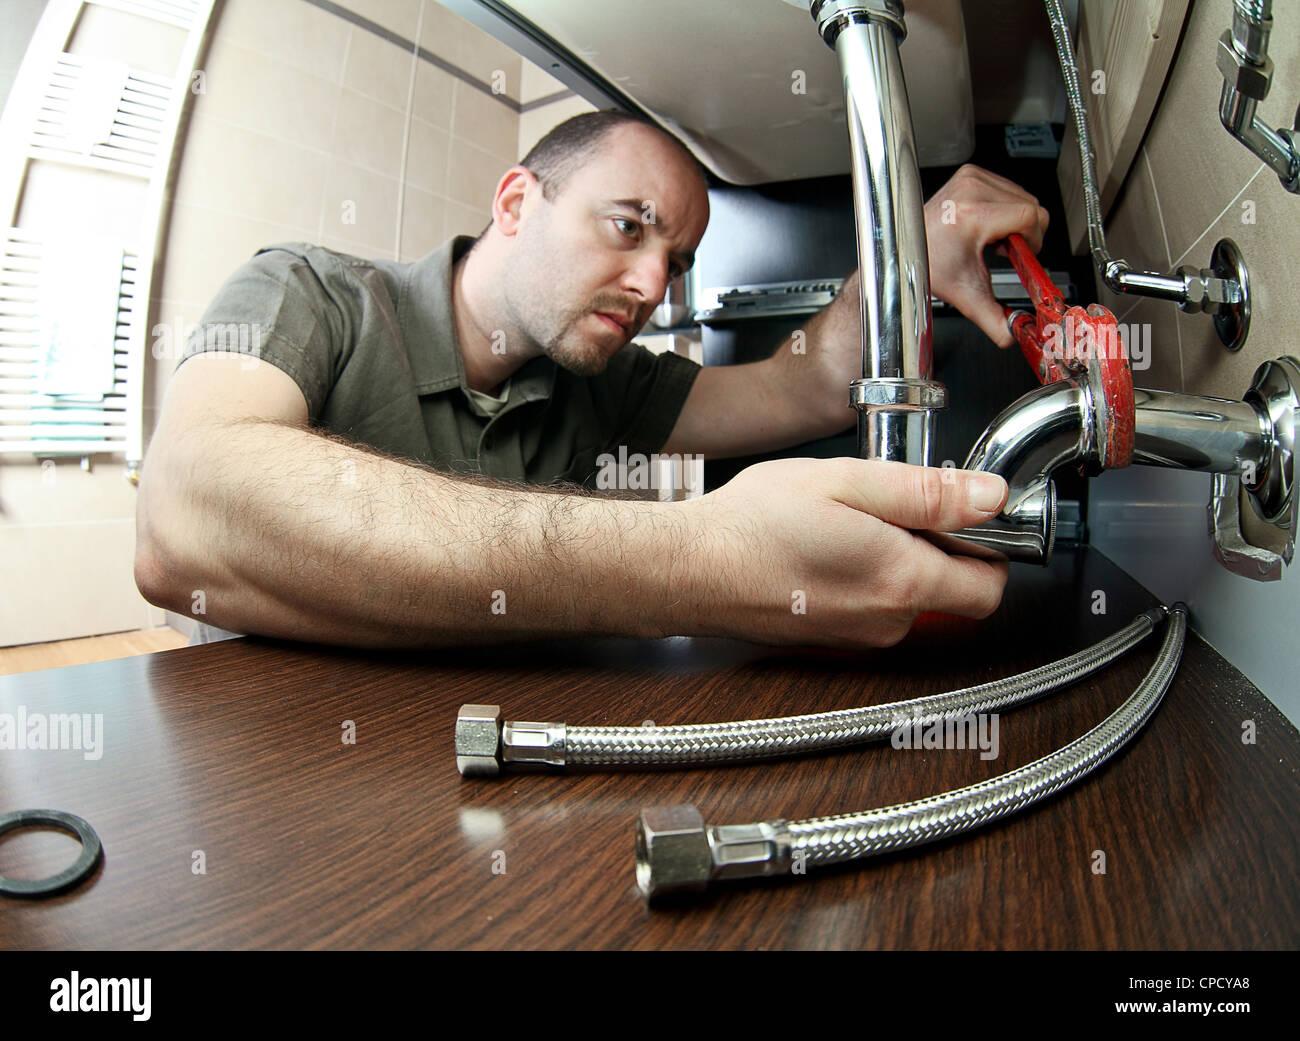 closeup image of young plumber at work - Stock Image